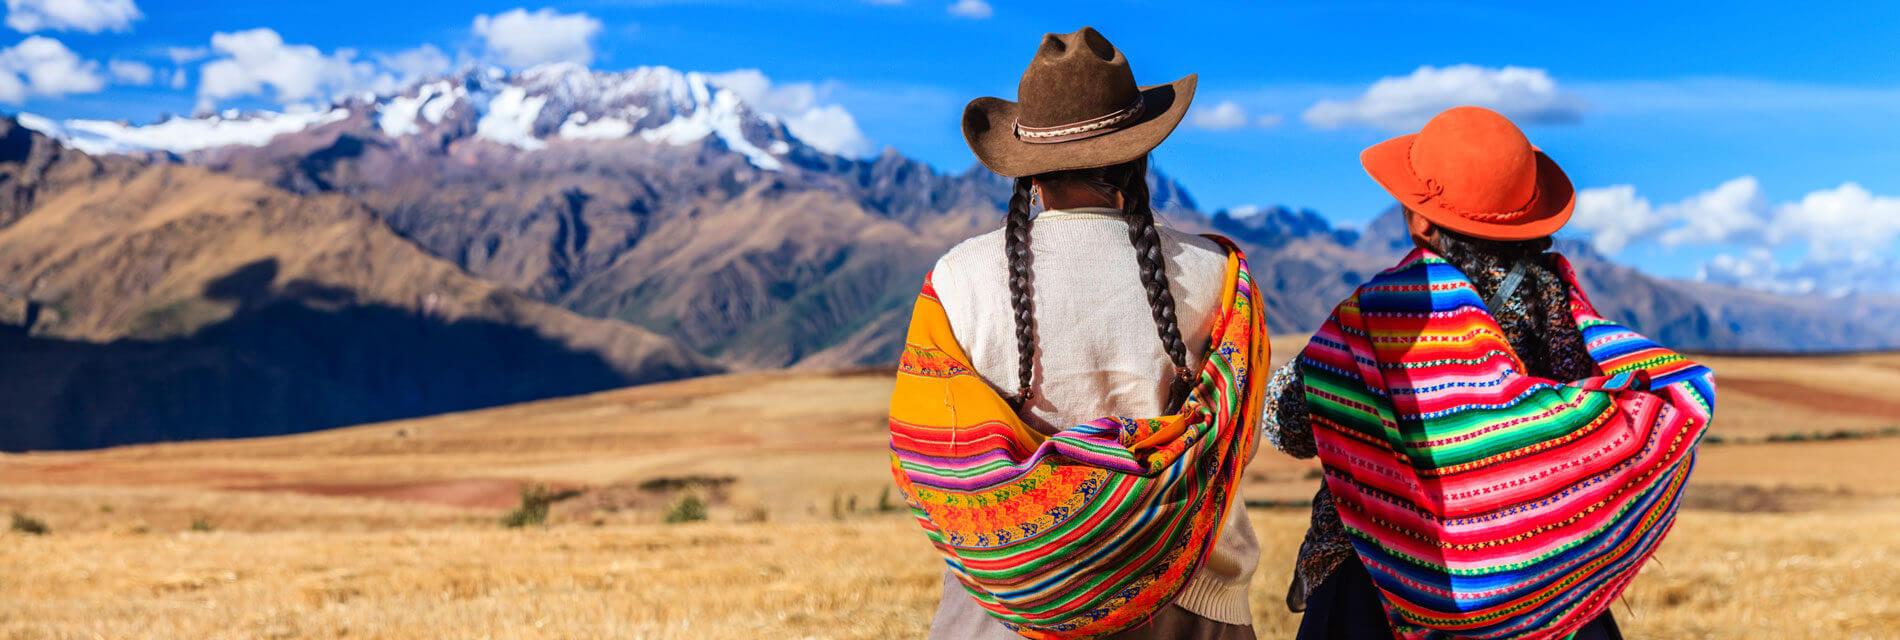 Resa Till Ecuador Galapagos Peru Med Svensk Guide